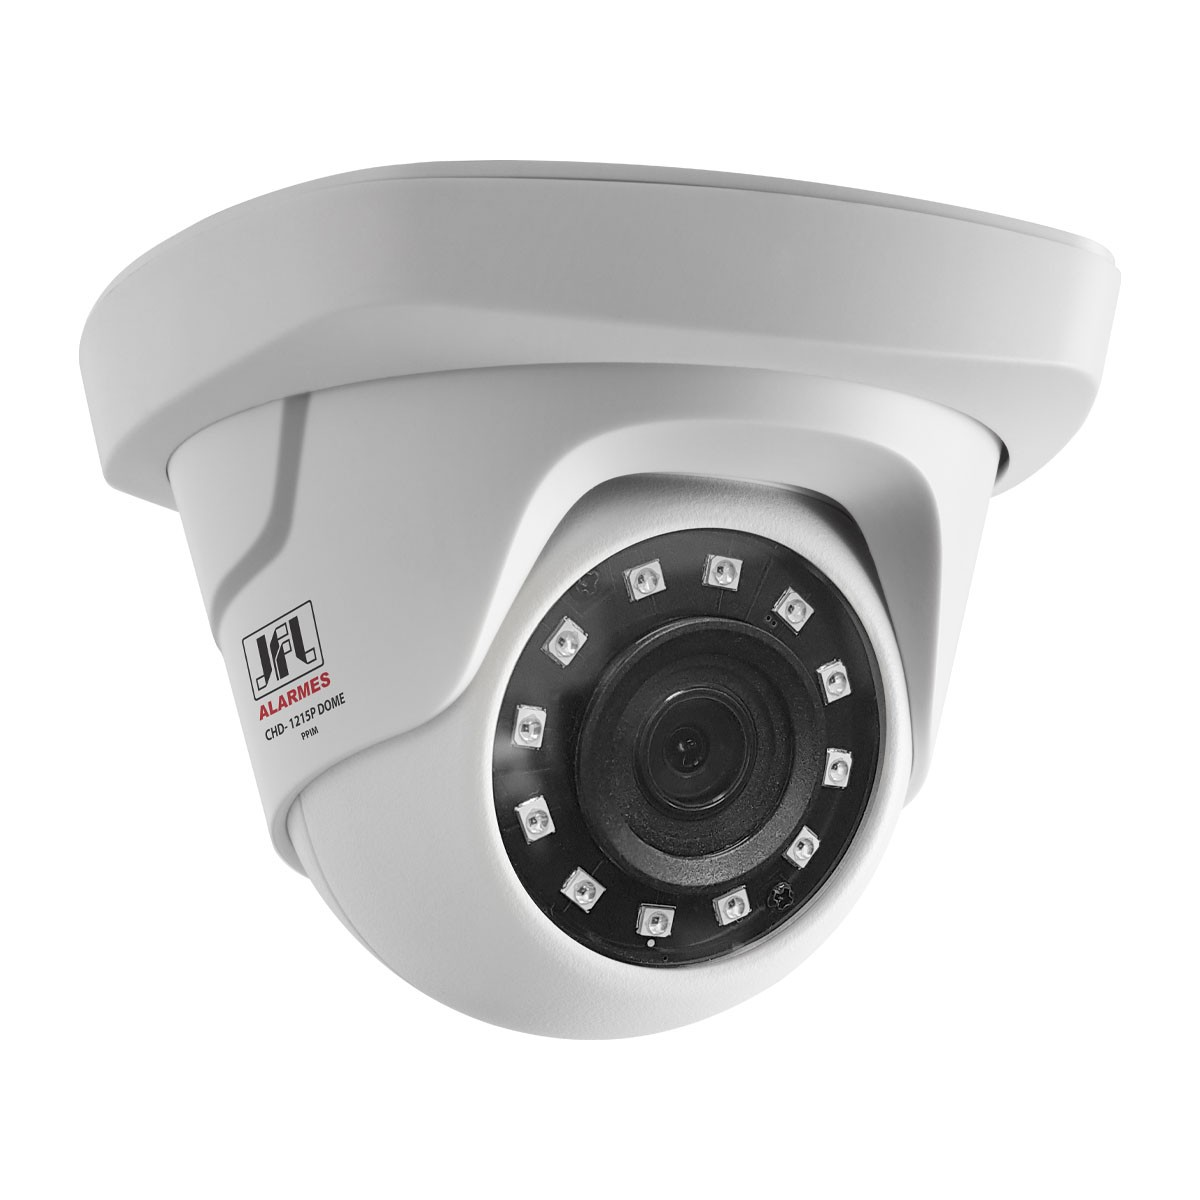 Camera Dome Hd 720p 4Em1 2.8mm Interna Chd 1215p Jfl